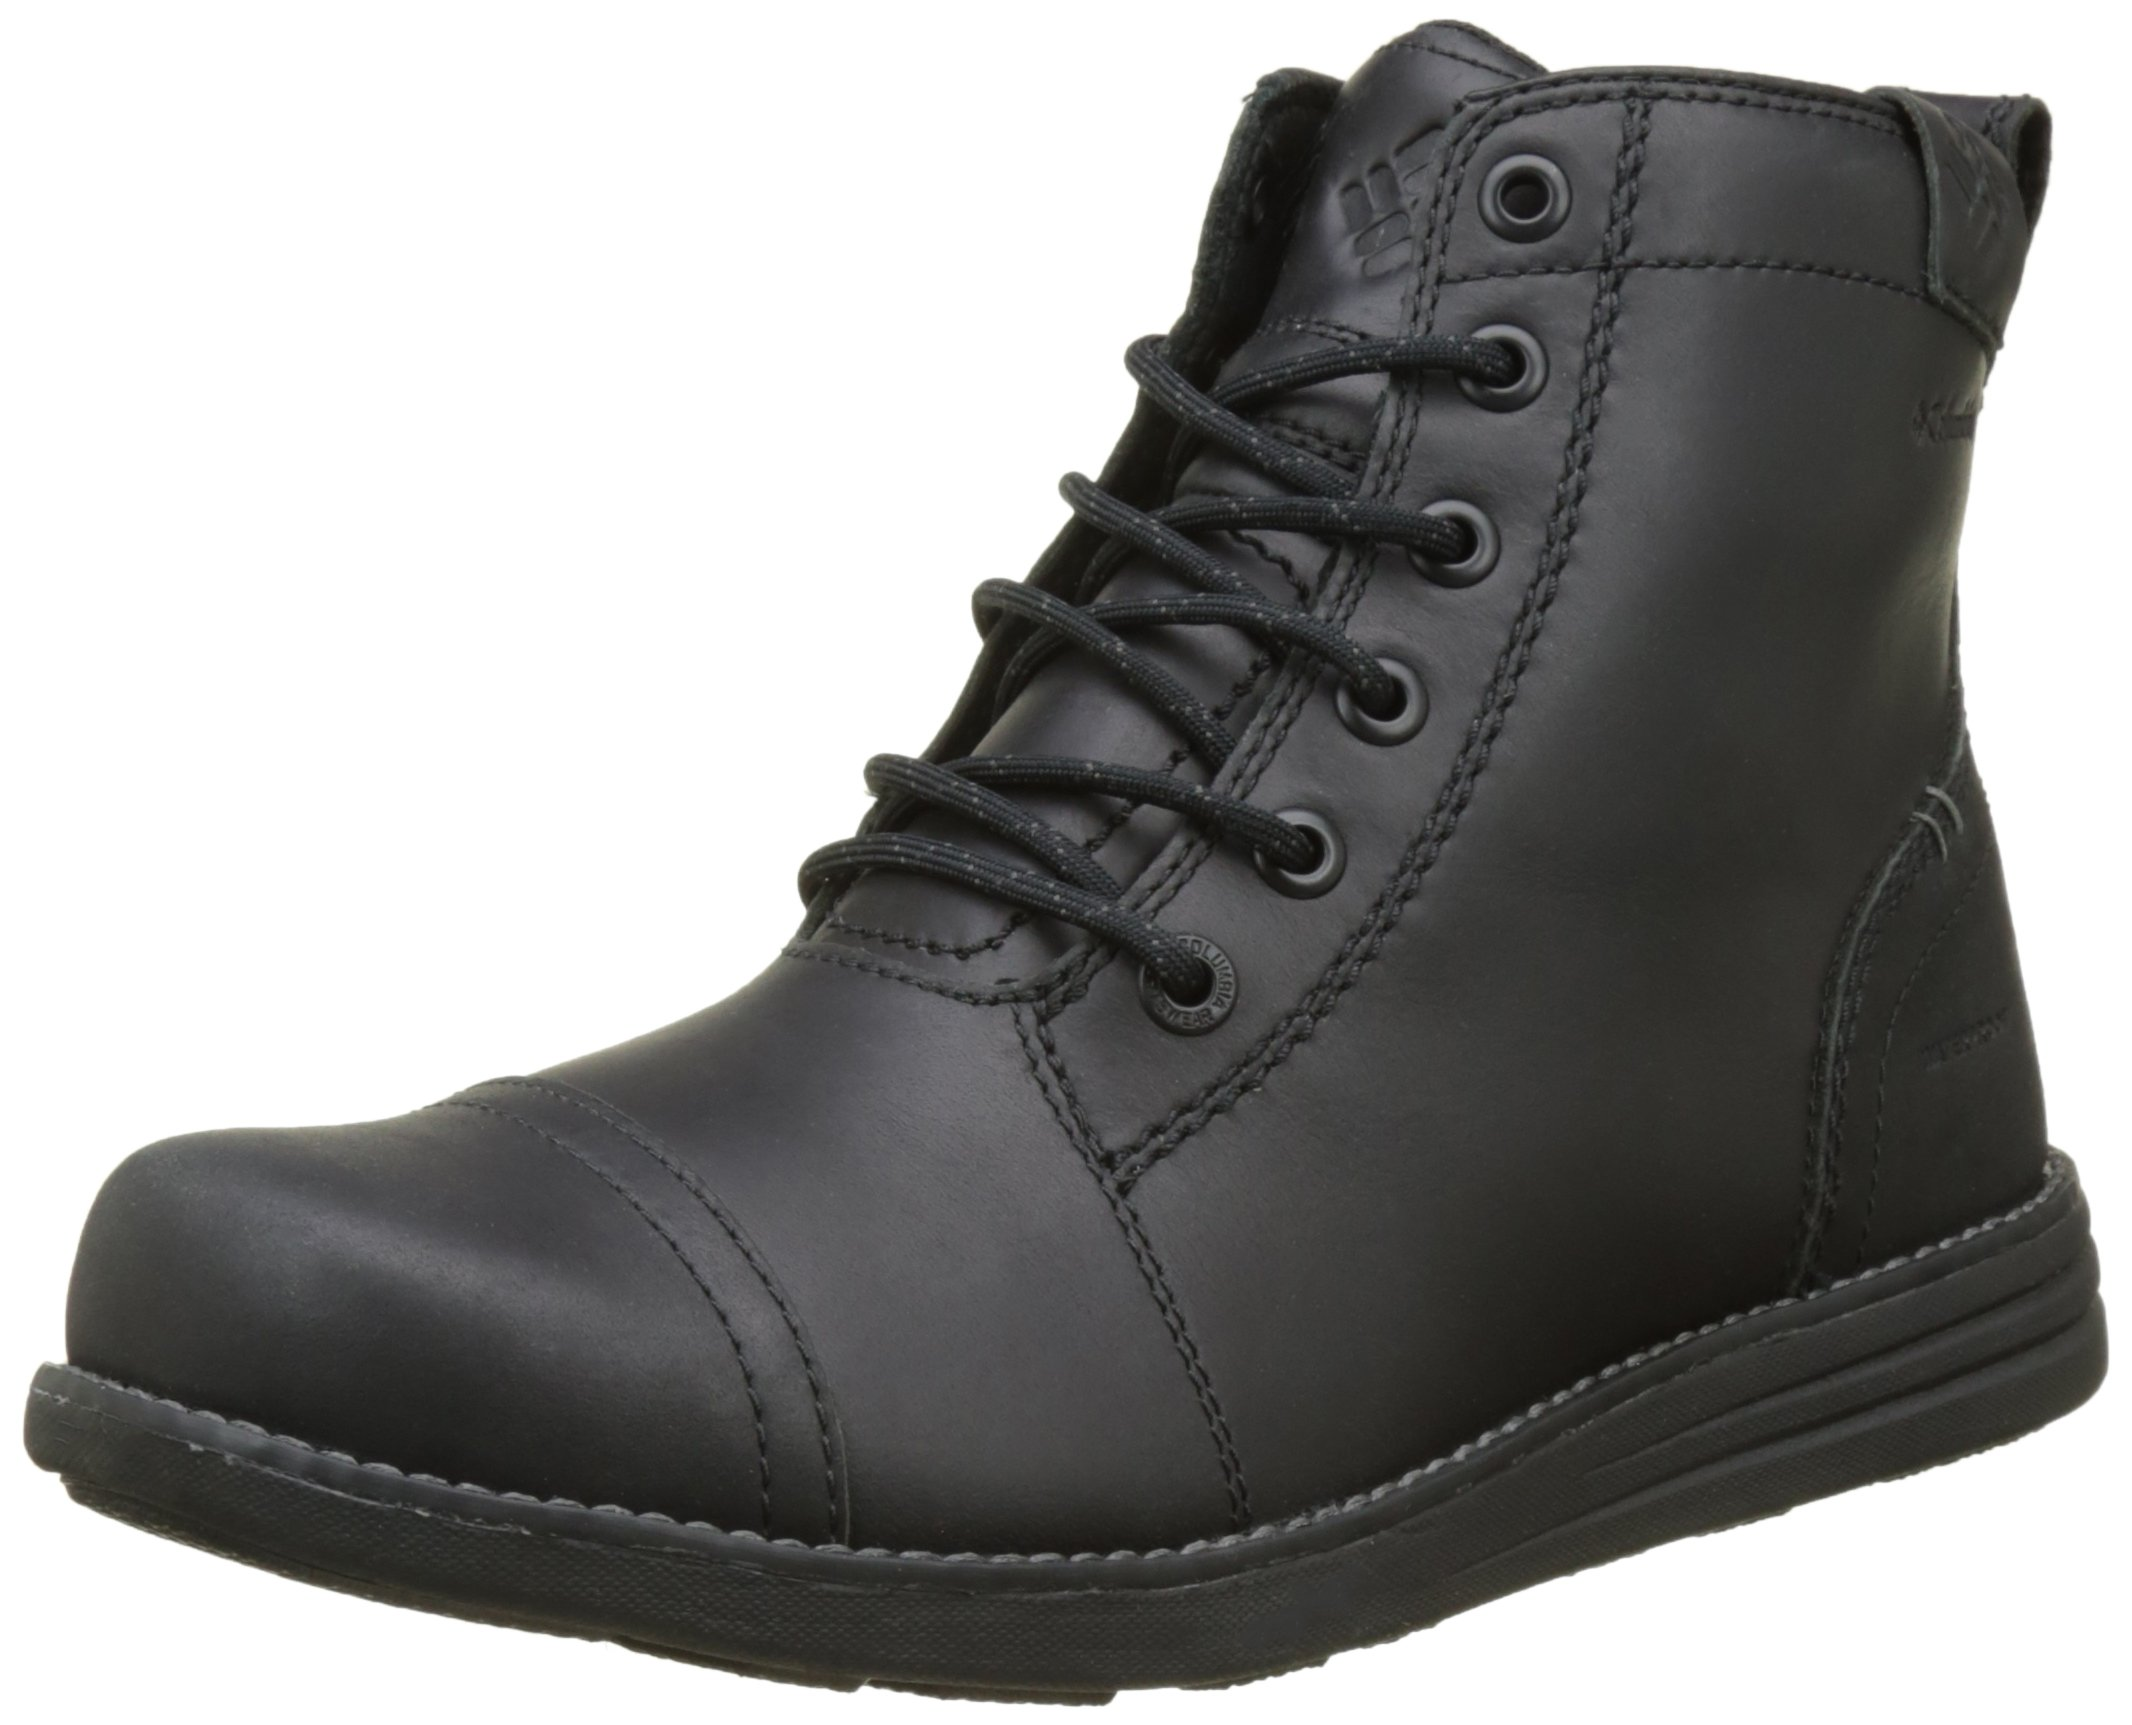 Columbia Men's Irvington 6'' Leather Boot Waterproof Uniform Dress Shoe, Black, Charcoal, 11 D US by Columbia